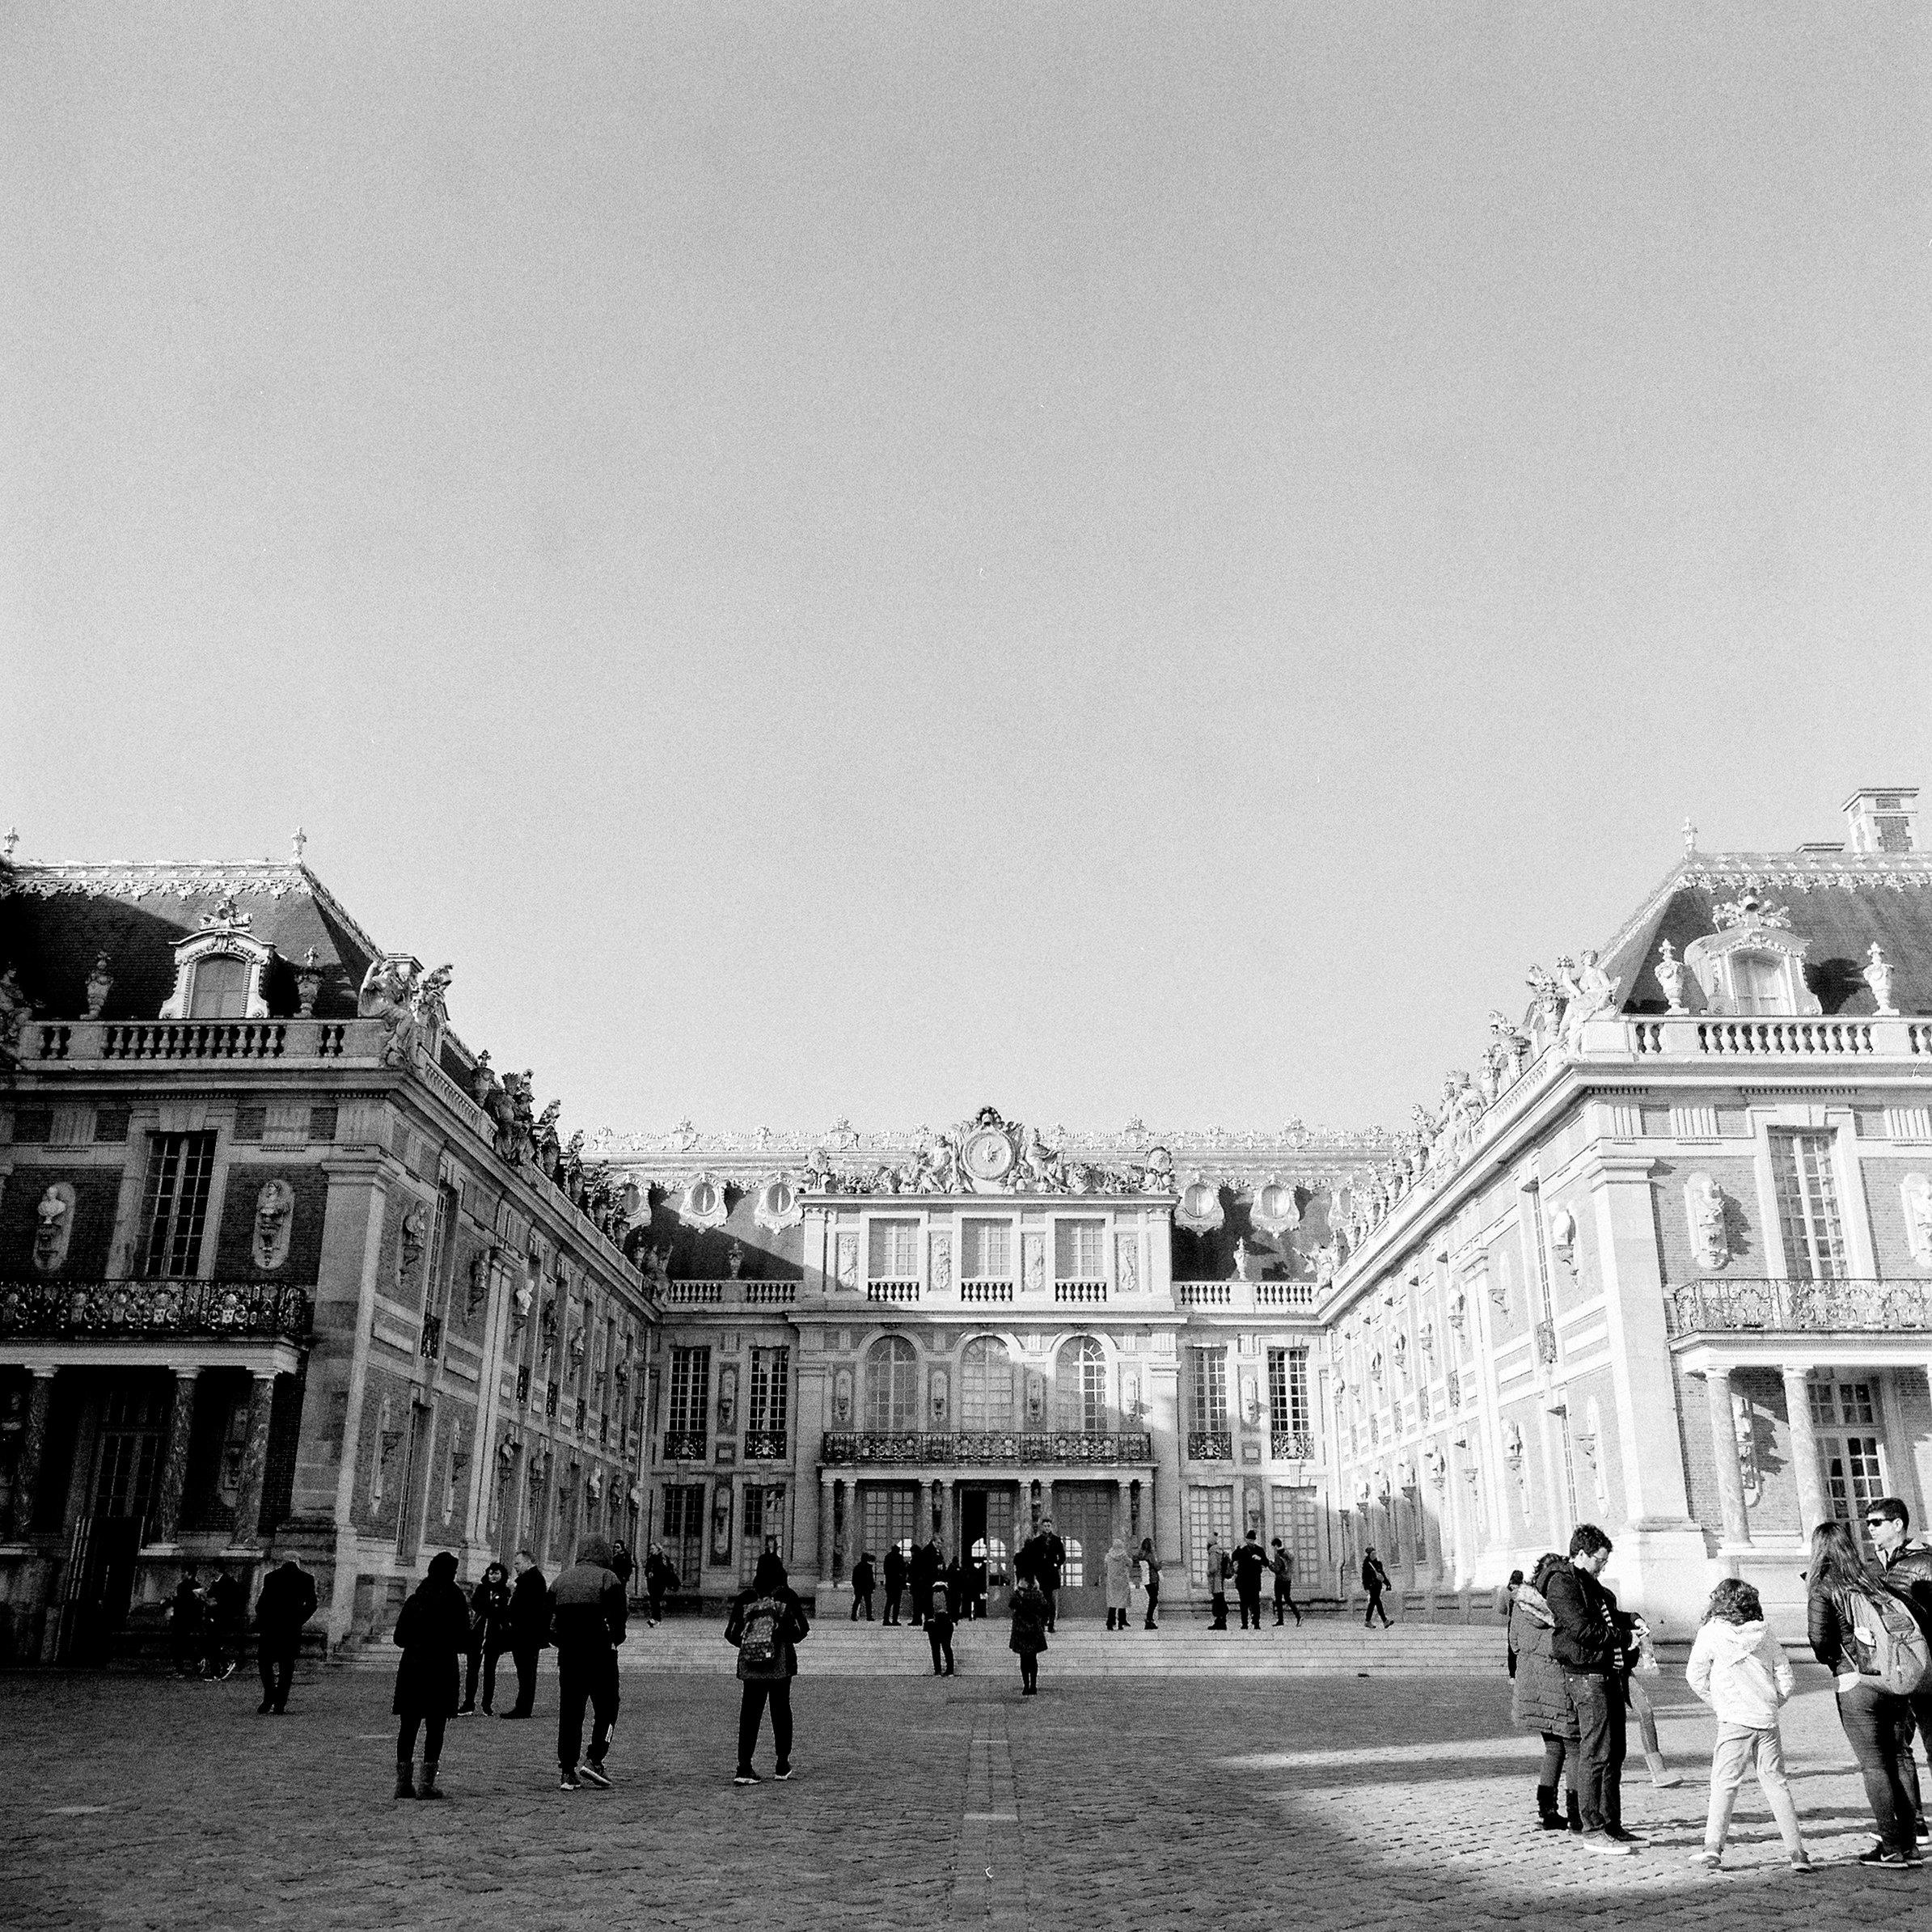 Palace-of-versailles-france.jpg